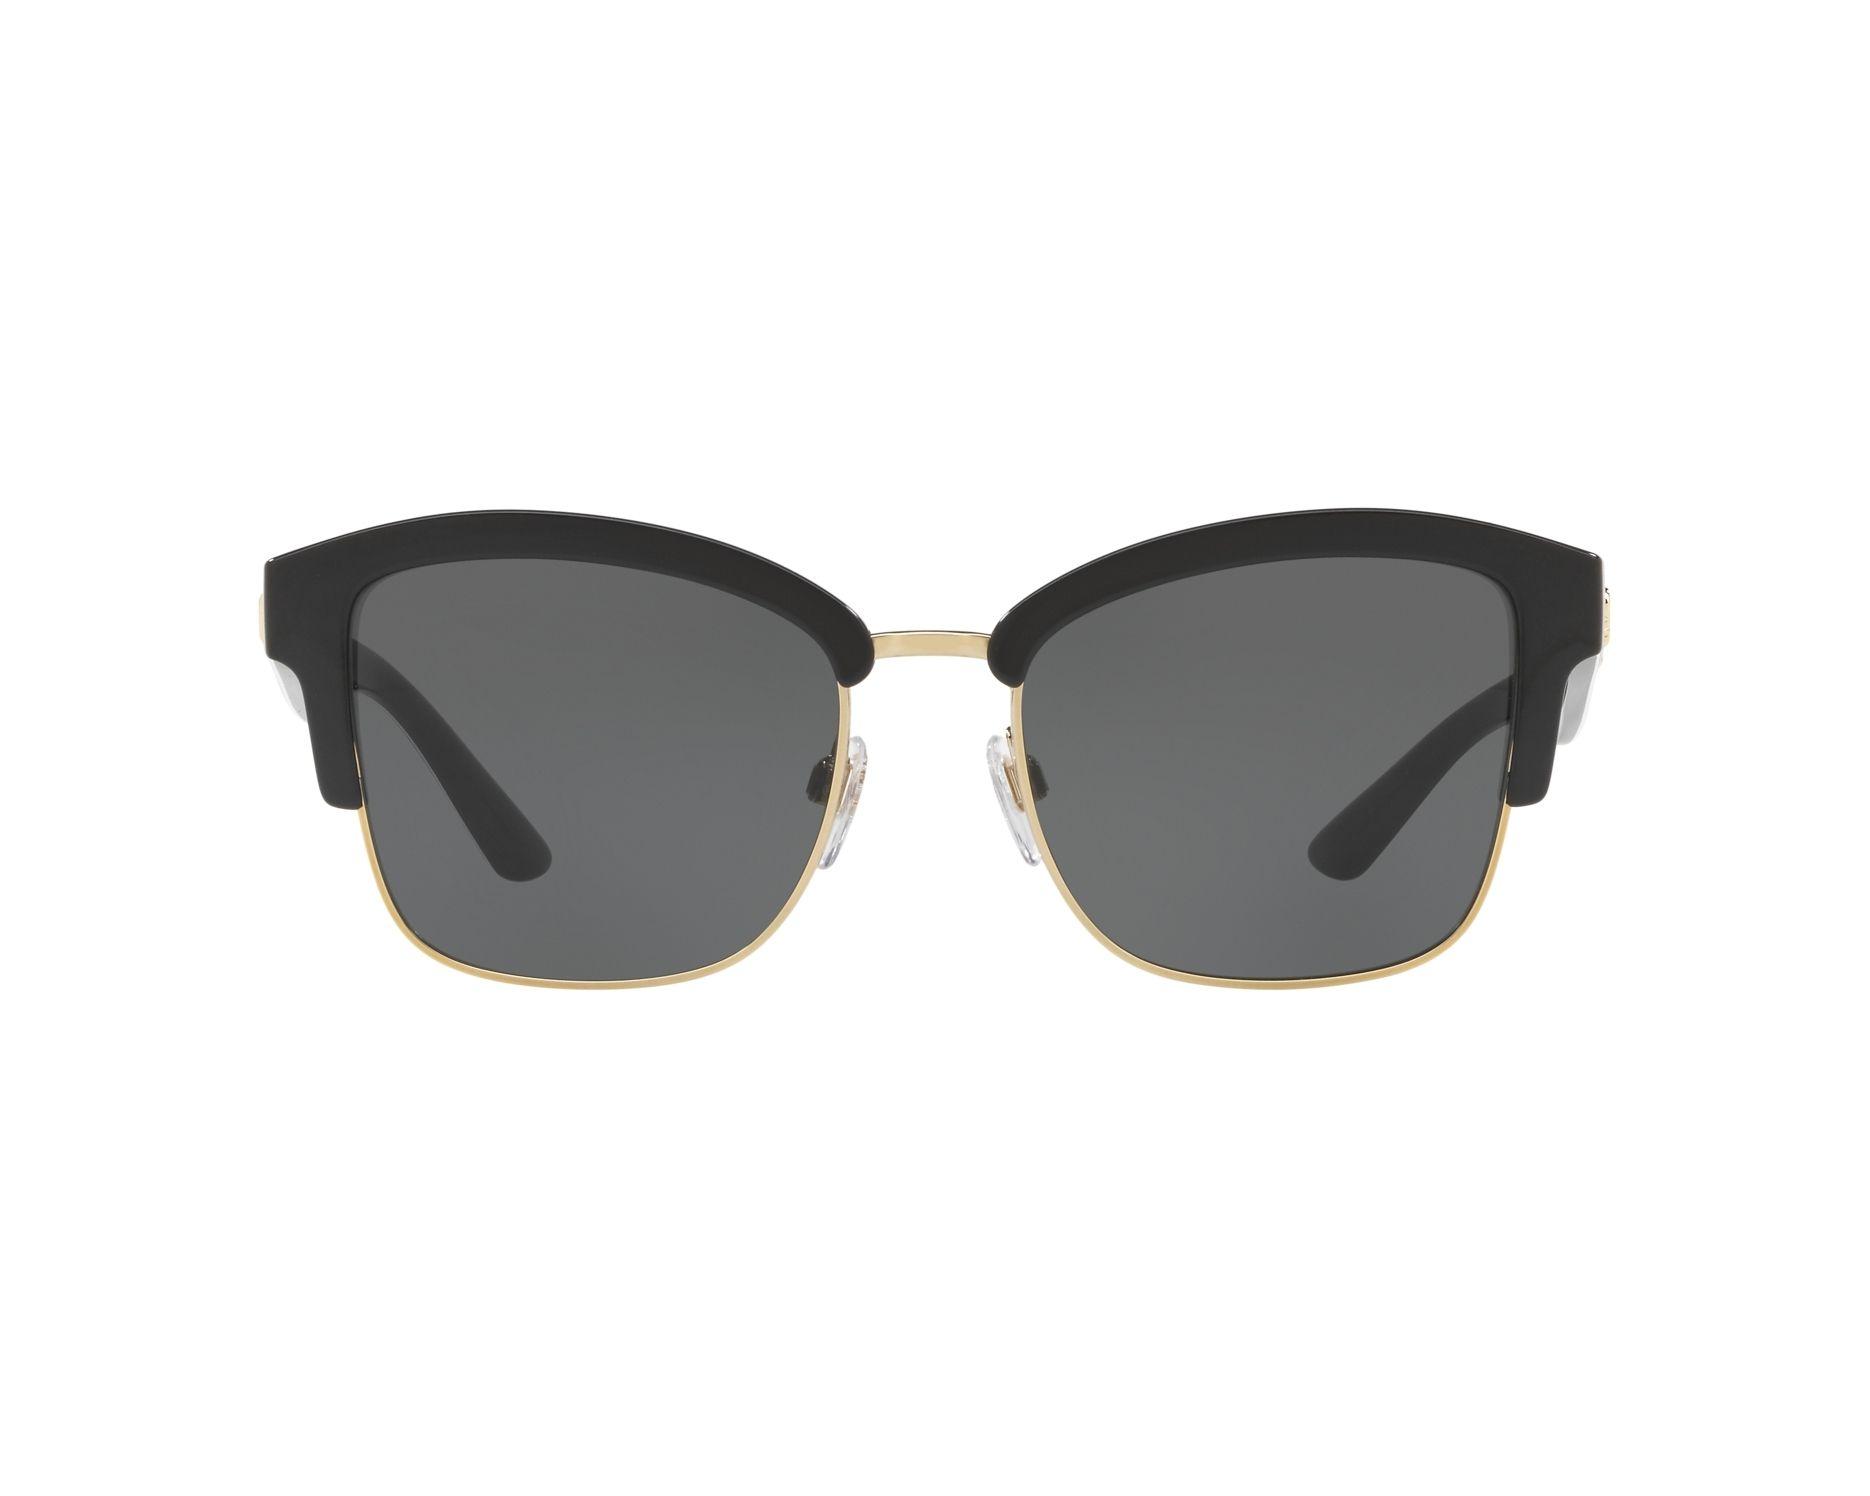 d796a10802bd Sunglasses Burberry BE-4265 372387 54-18 Black White 360 degree view 1